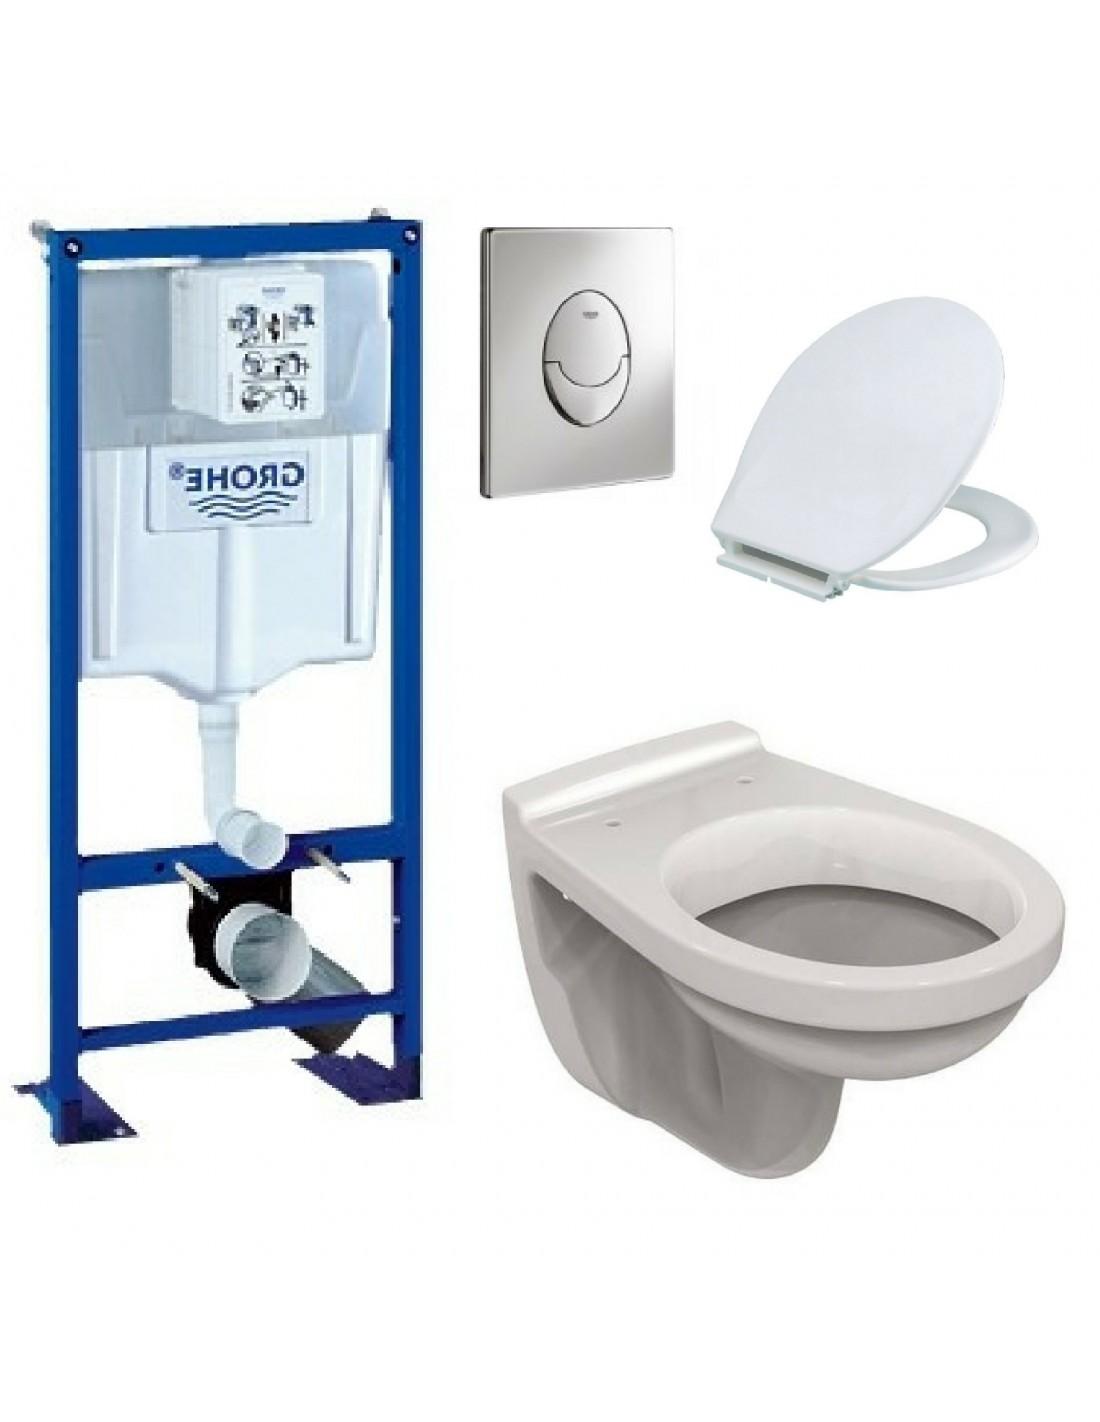 Bati support ulysse wc suspendu grohe plaque grise ebay - Wc suspendu grohe ...